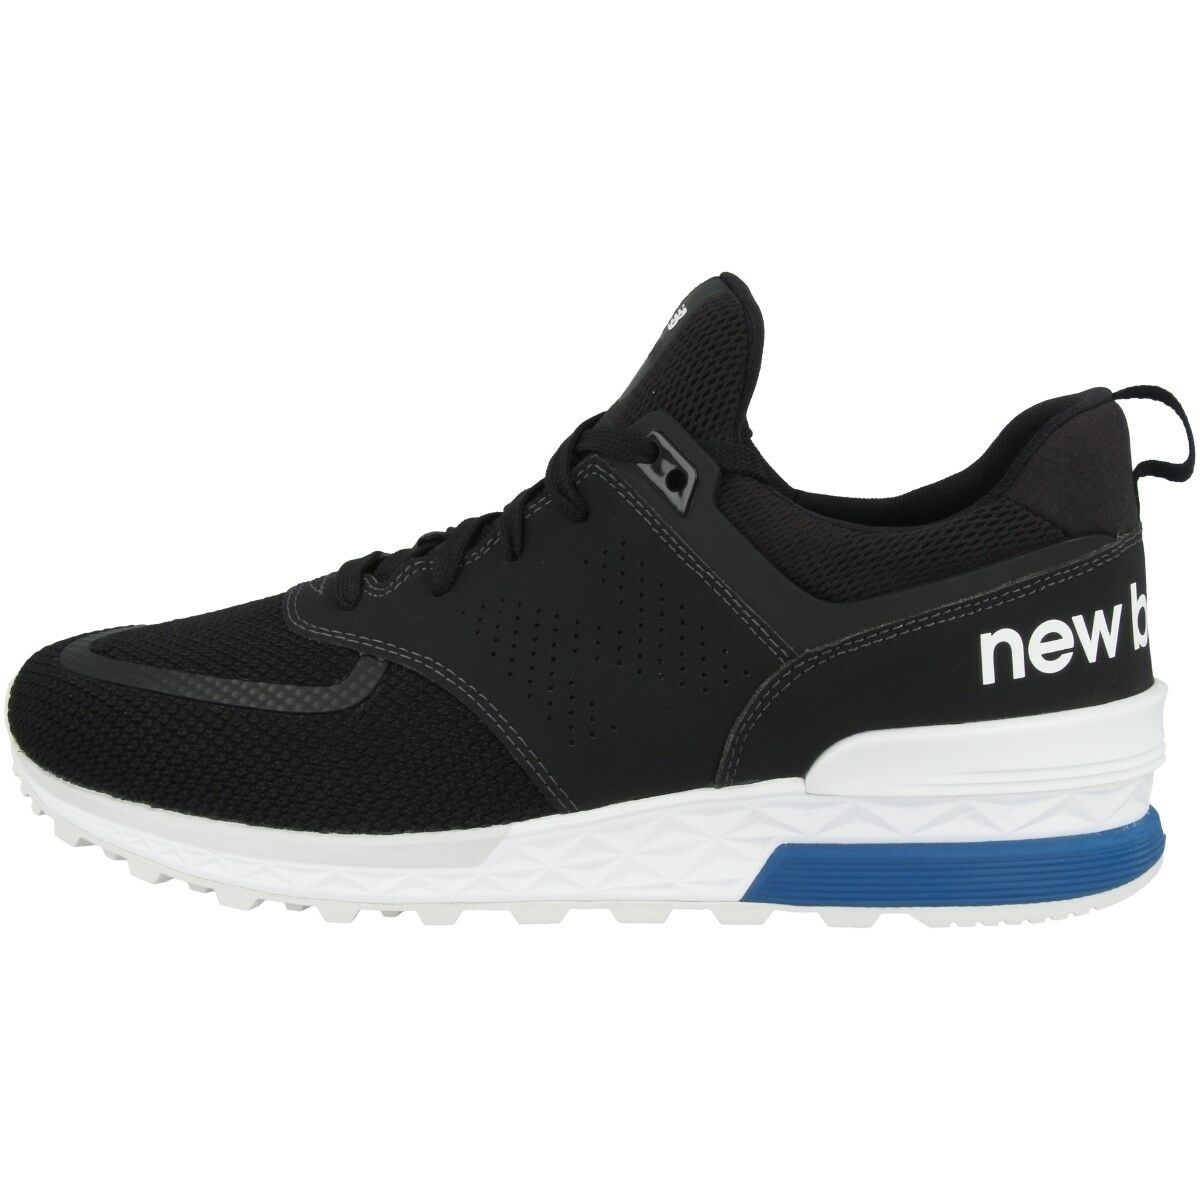 New Balance Ms 574 Pcb shoes Sport men Retrò Sneakers Casual Black MS574PCB